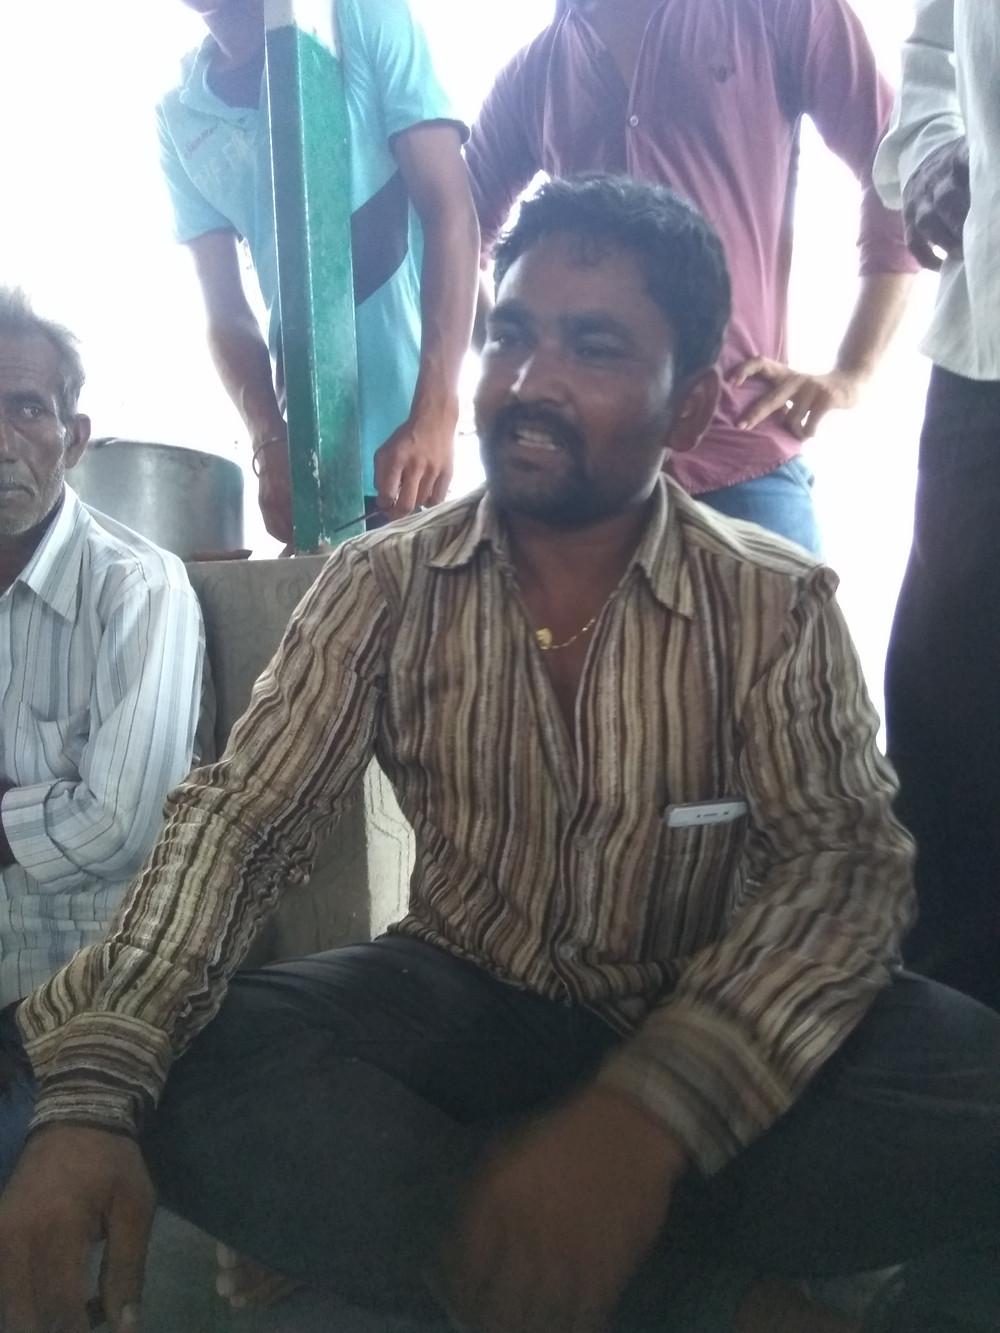 Munna Bhai, a grassroot innovator